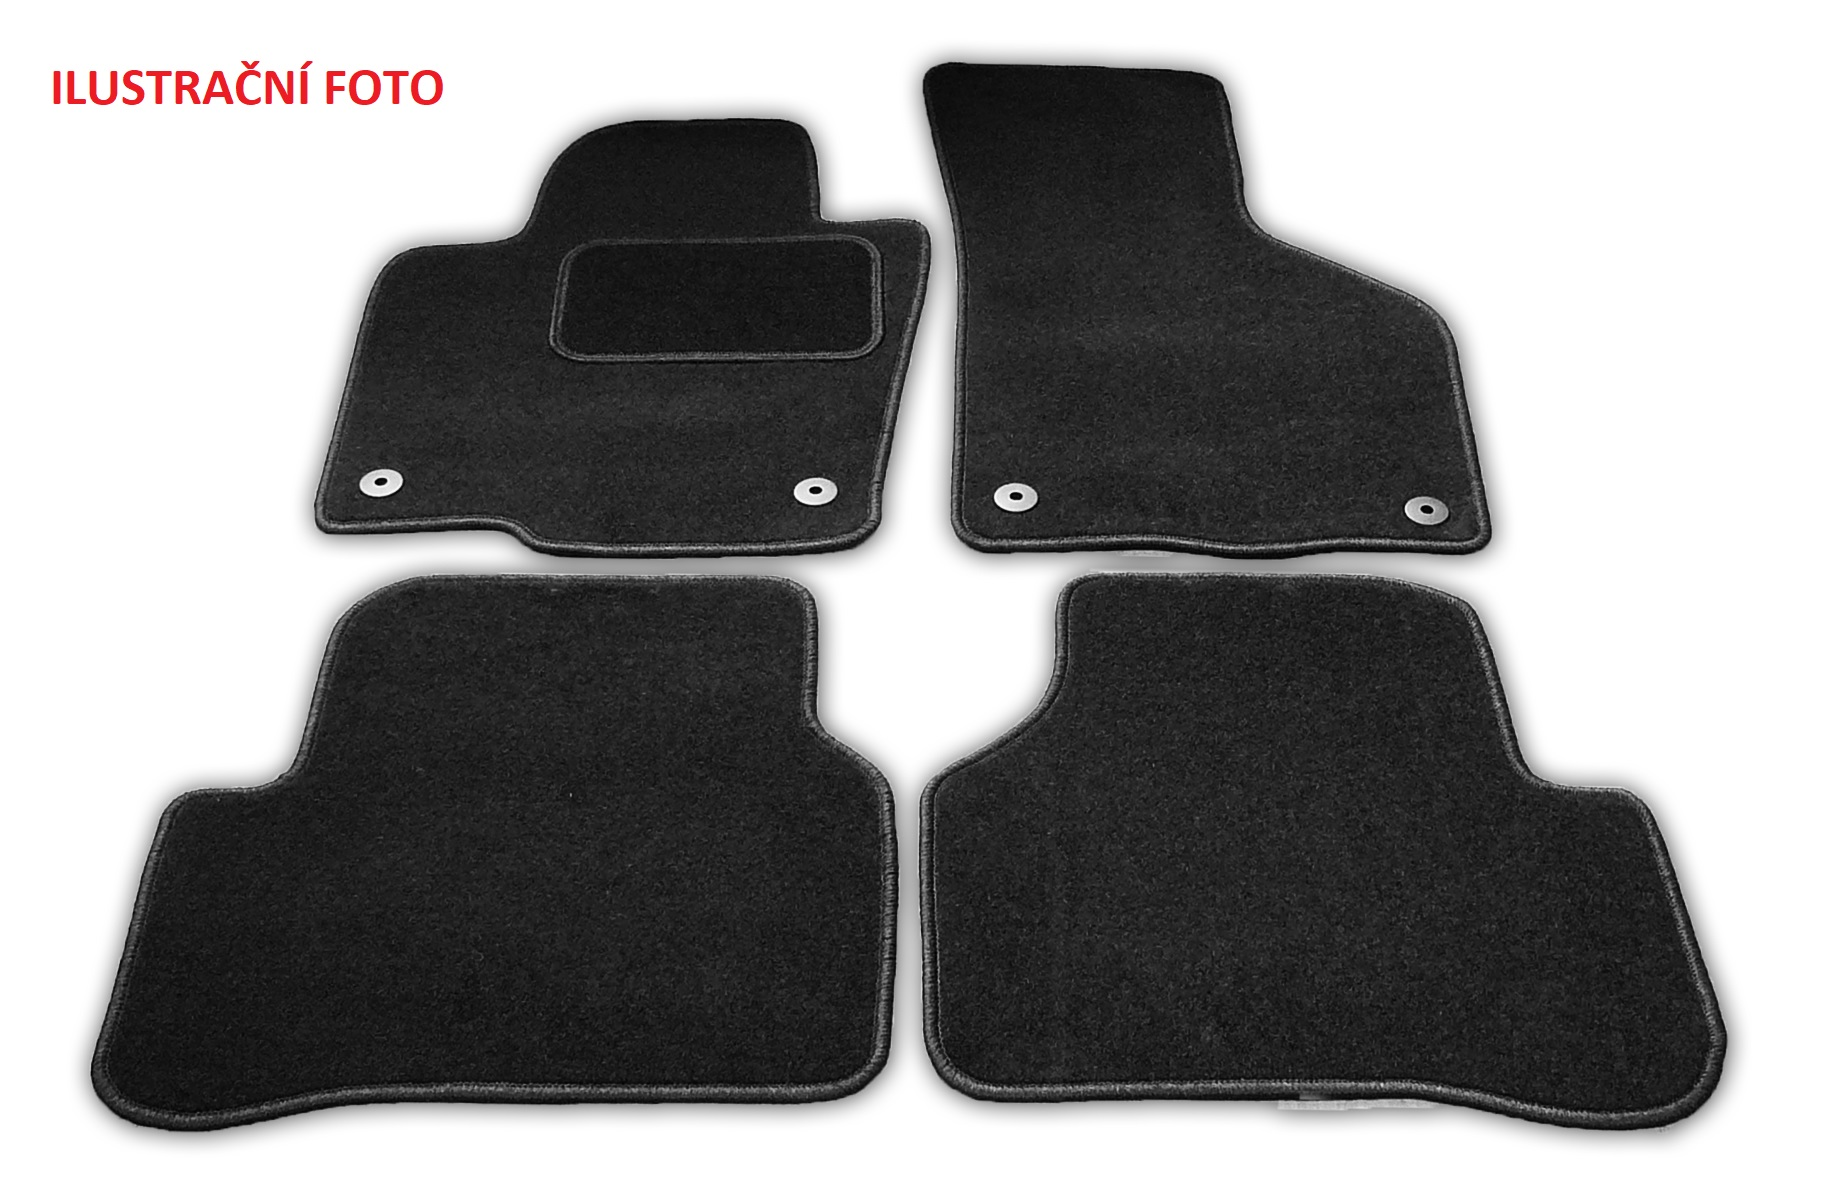 Automega Textilní autokoberce Standard BMW 4 F32/F36 2014-